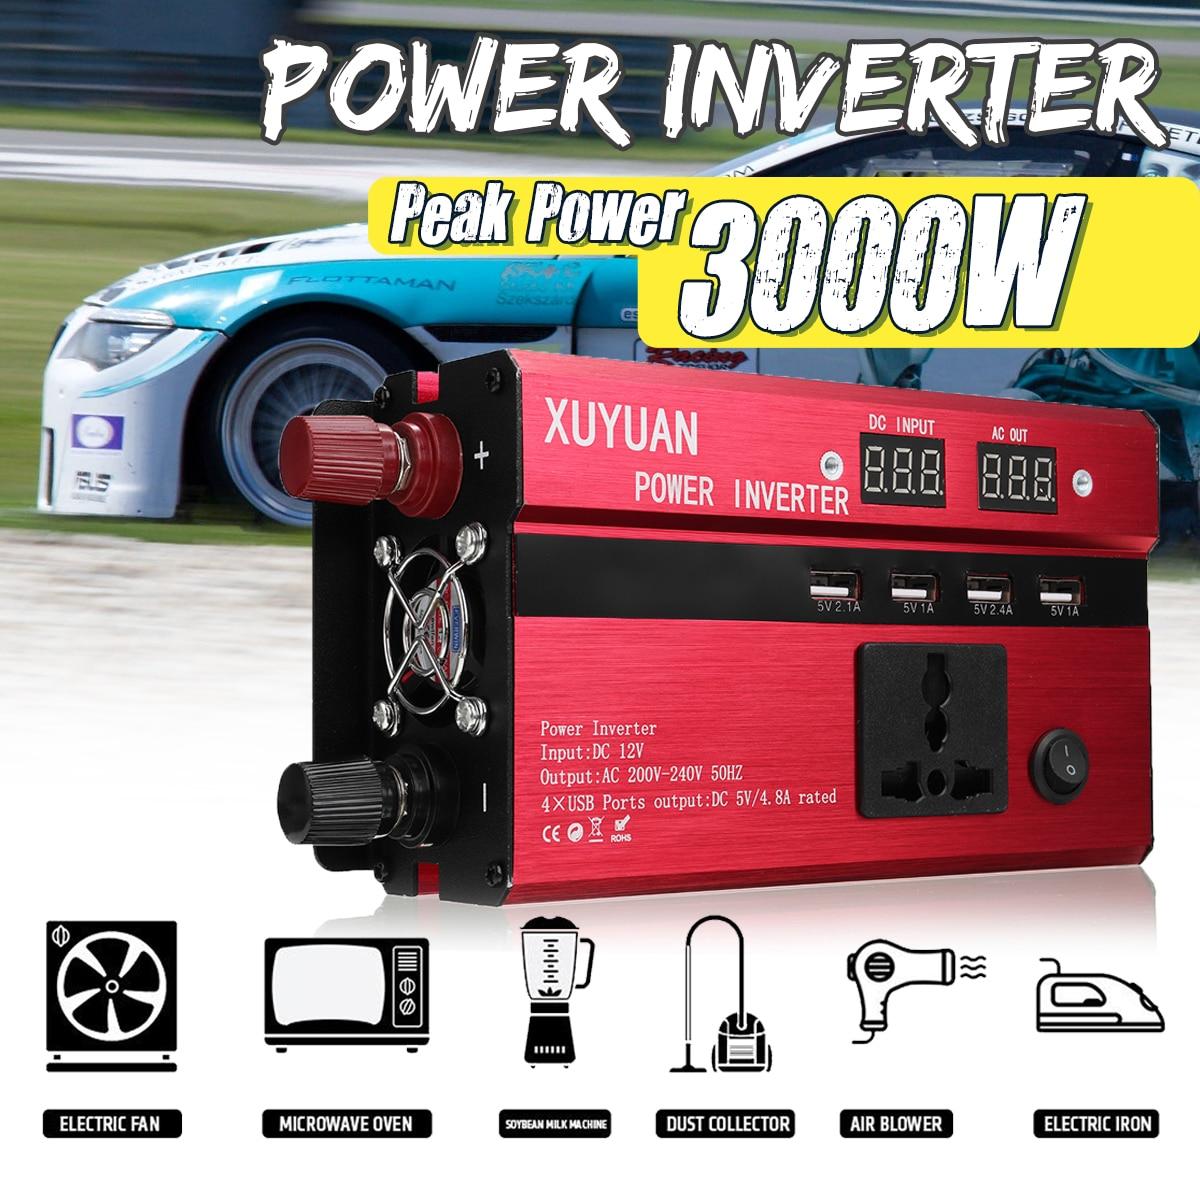 Inverter 12V 220V 3000W Peak Car Power Inverter Voltage Transformer Converter 12 220 Charger Solar Inversor 12V 220V LCD Display car inverter 12v 220v power inverters voltage transformer converter 12 220 1000w charger on display solar adapter 12v 220v dy104